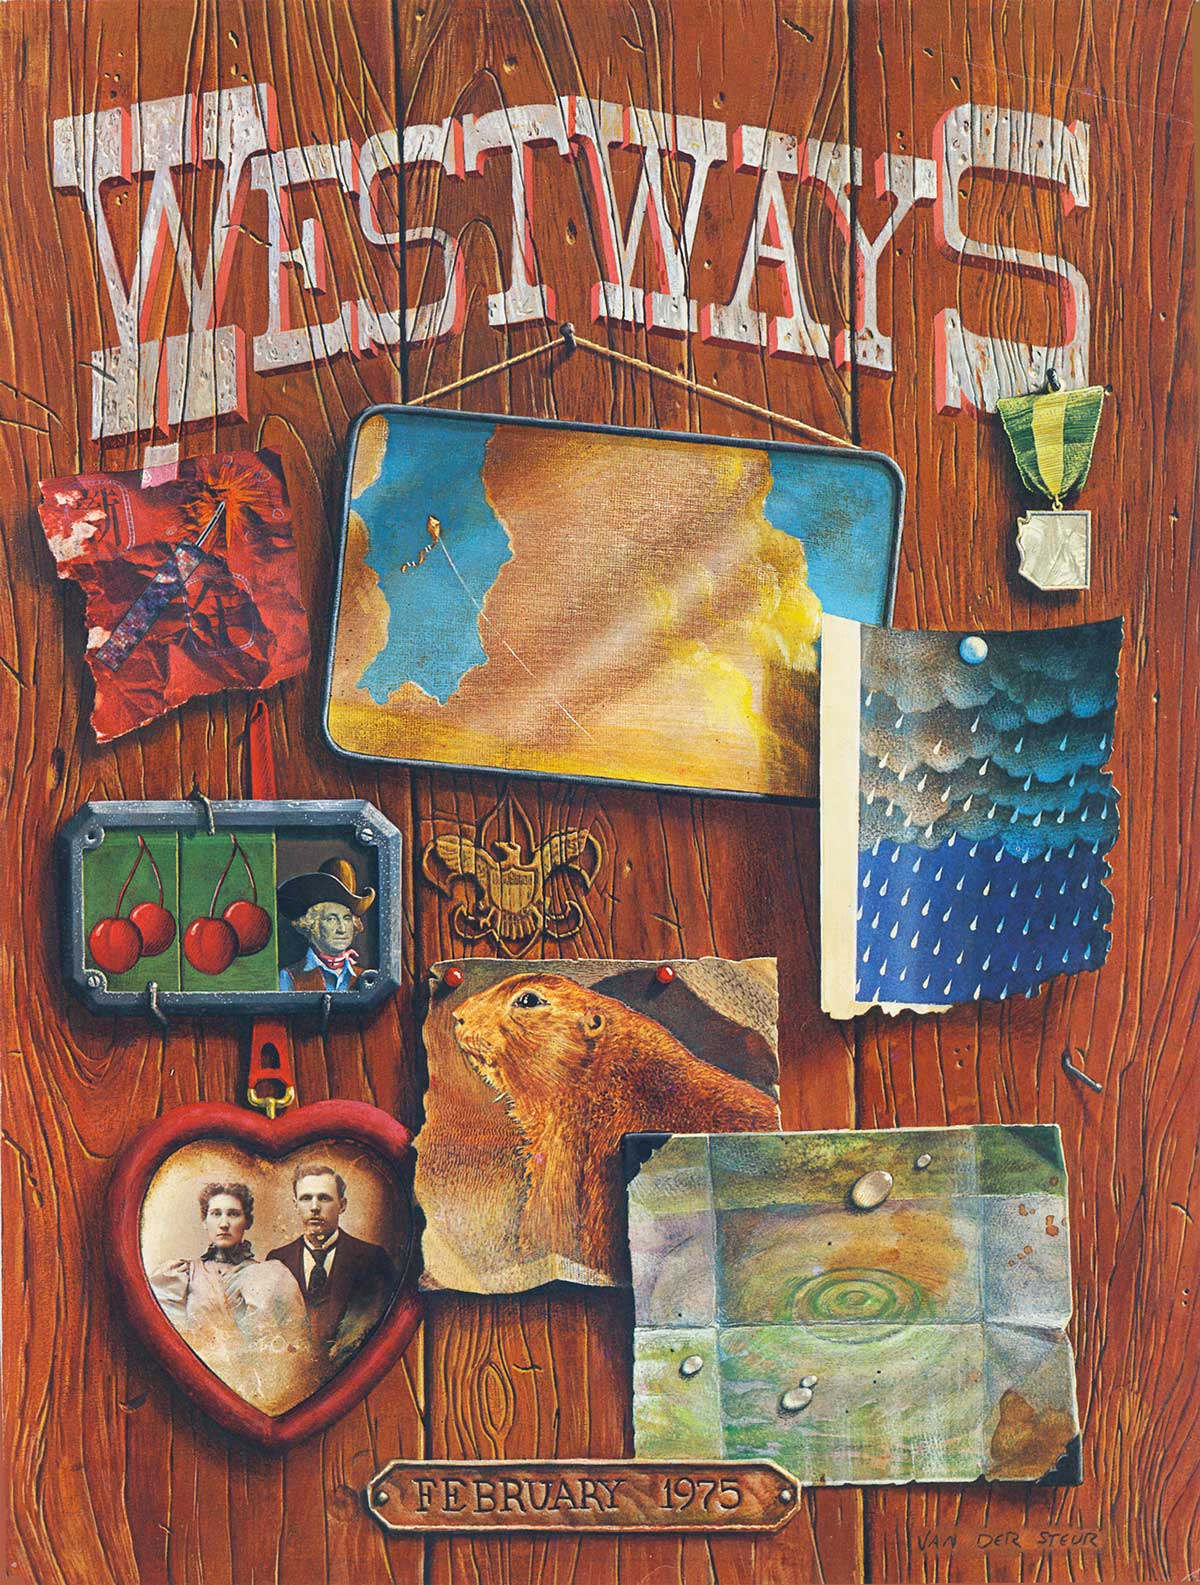 Westways  Cover,  1970s